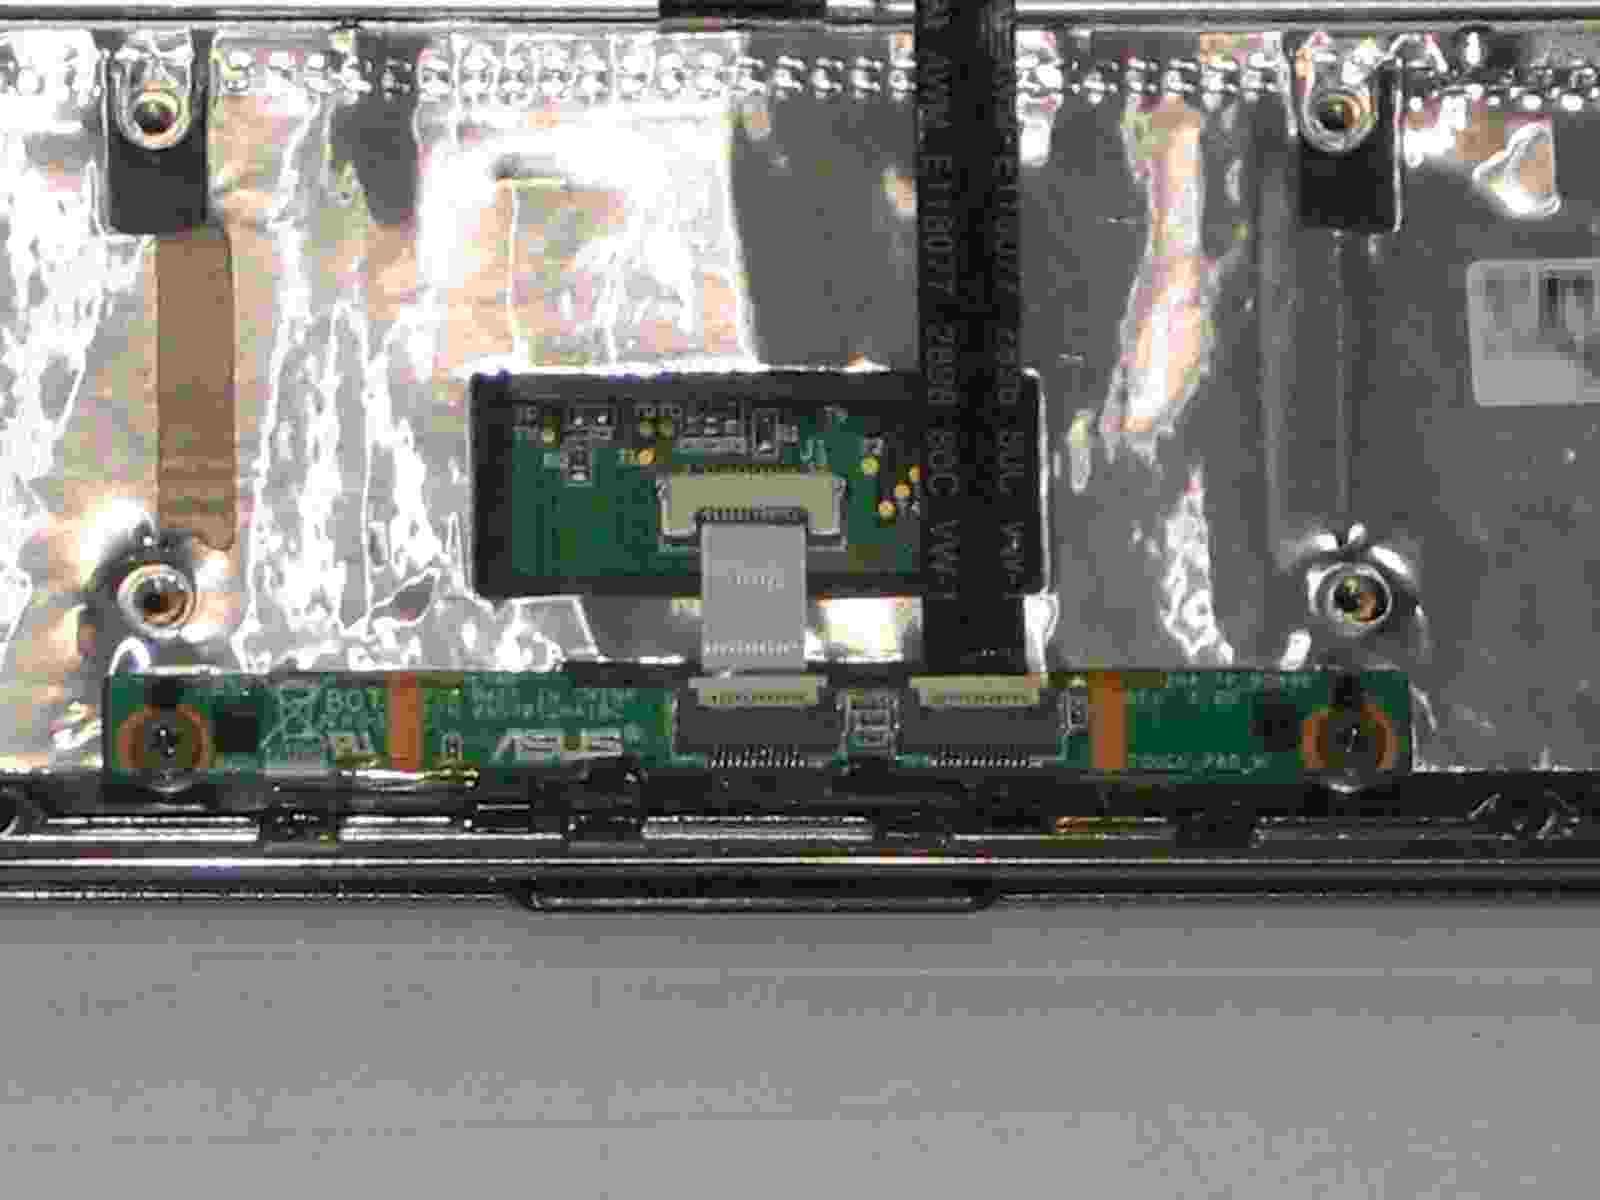 ASUS Eee S101H 筐体下部のディティール4 タッチパネル周辺の配線